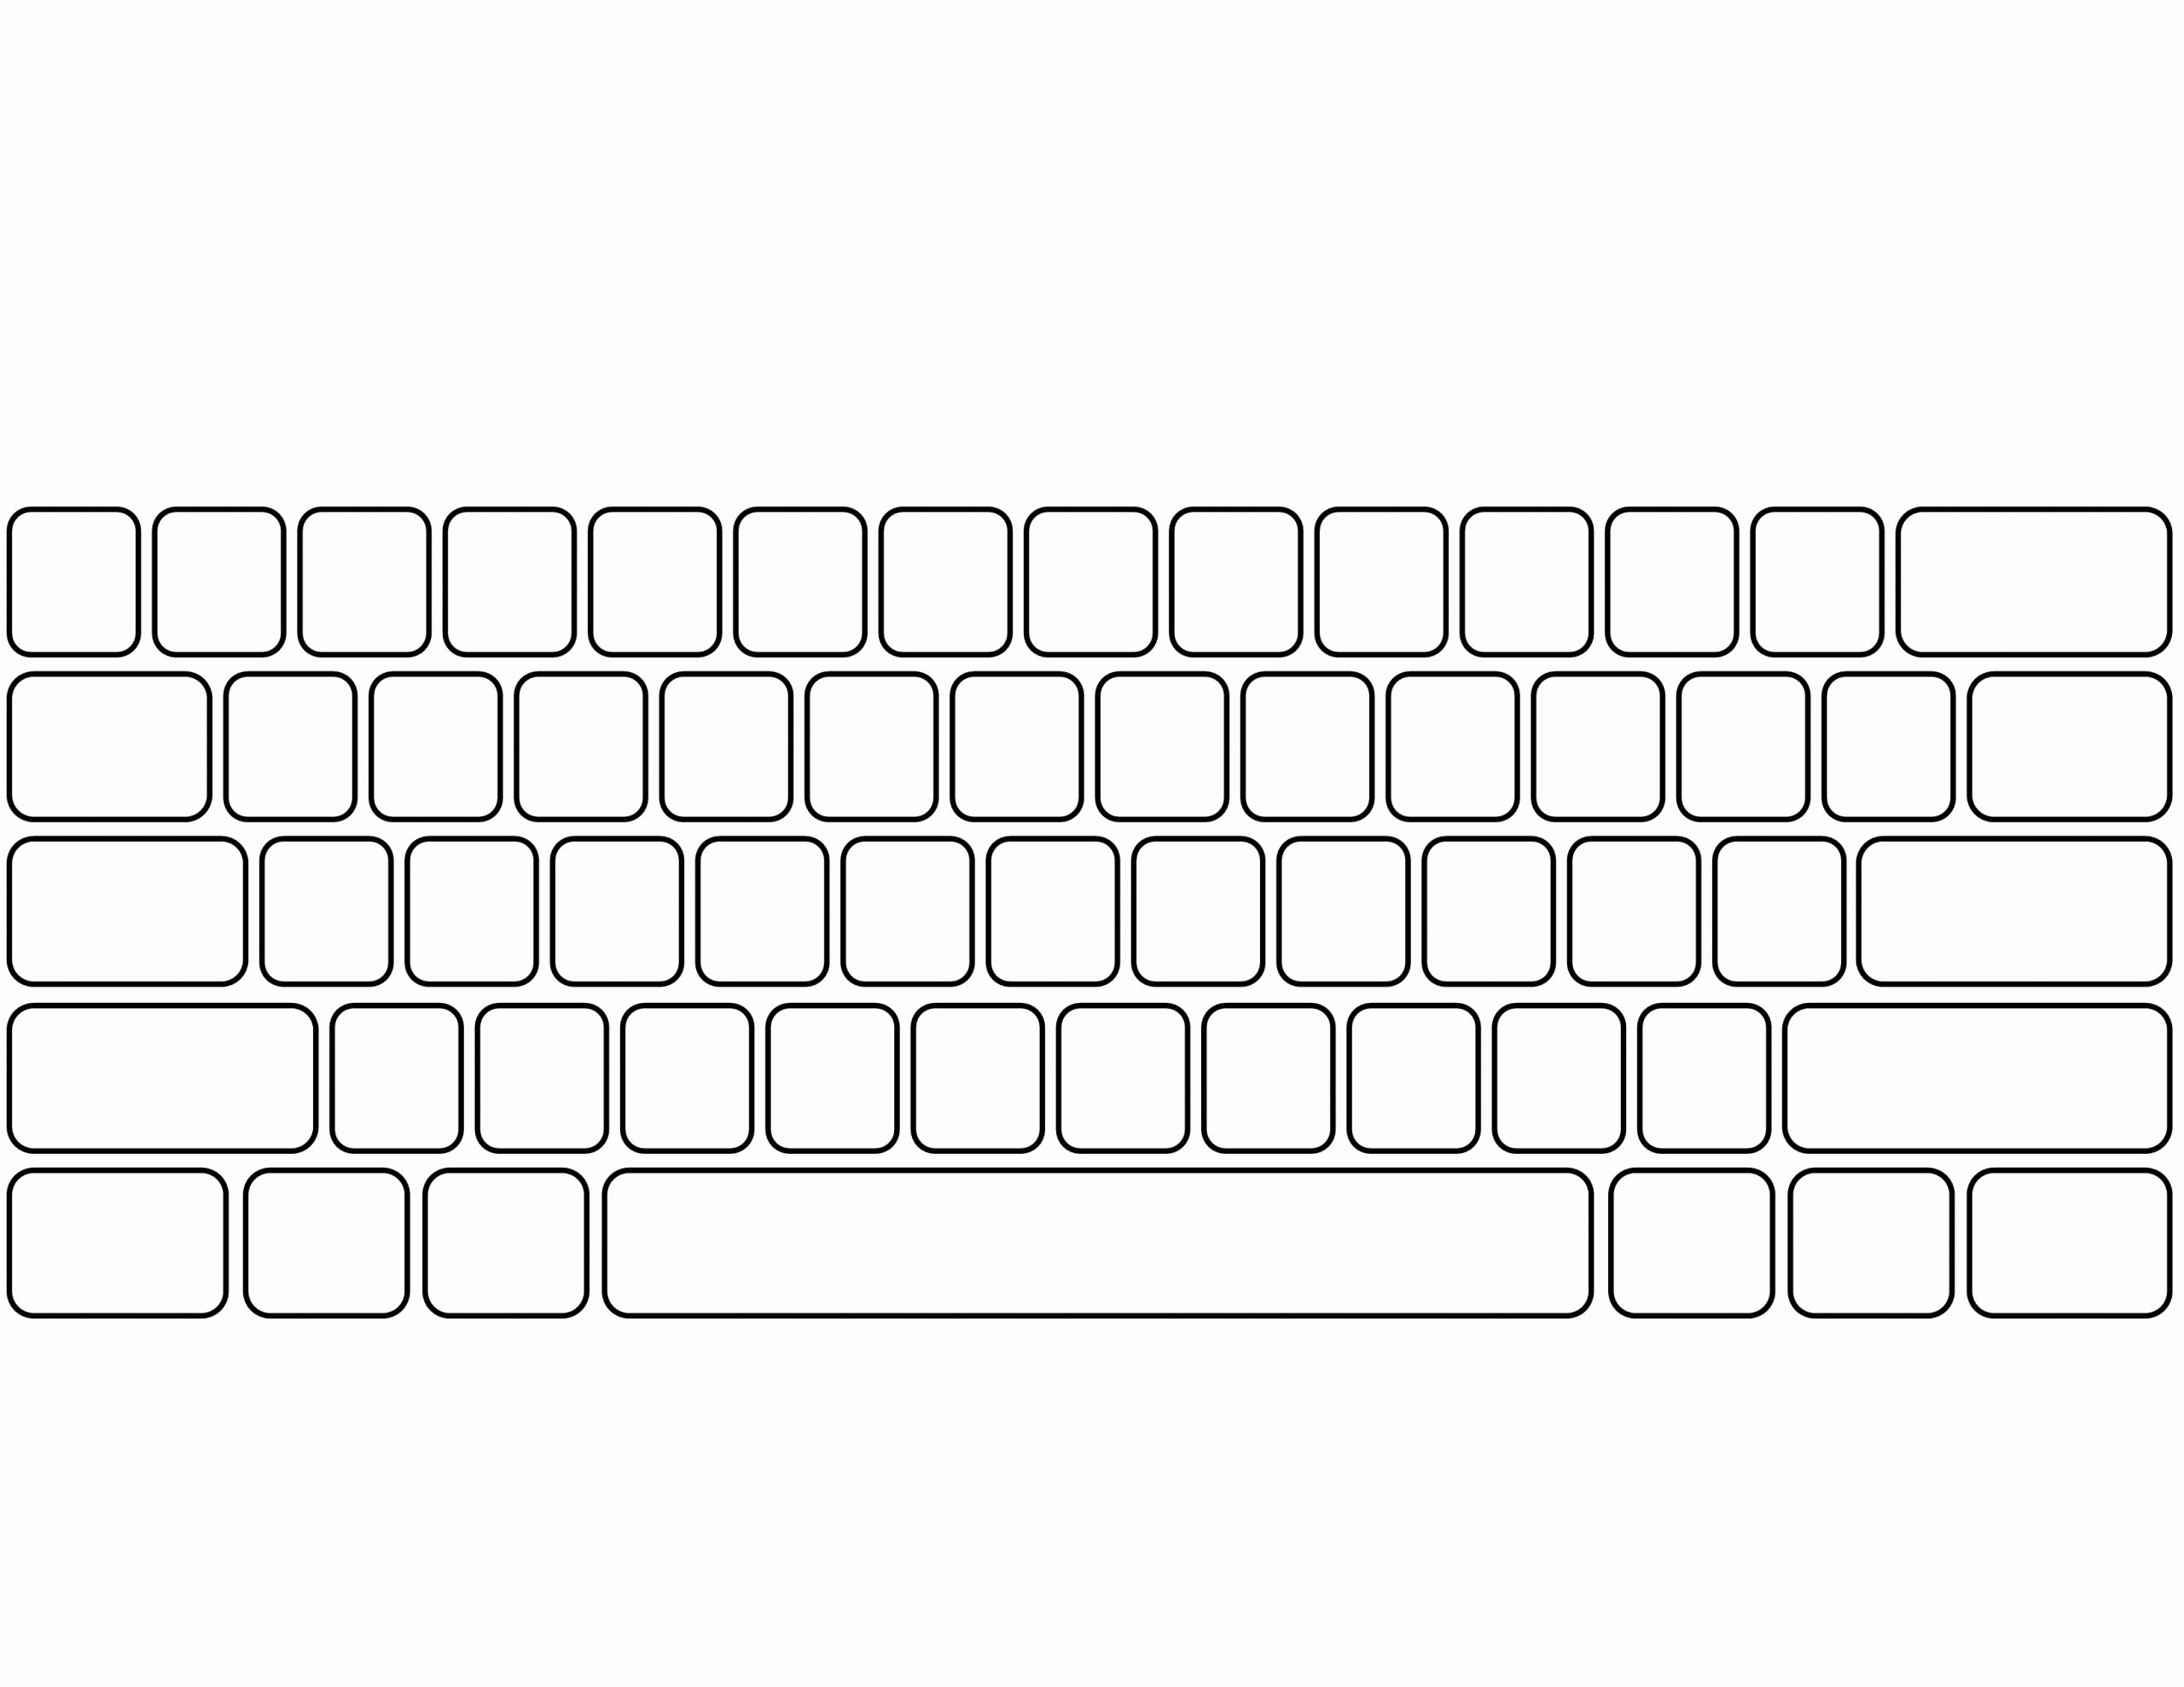 Free Printable Computer Keyboarding Worksheets New Puter Keyboard Worksheet Printable Page 1 Line 17qq